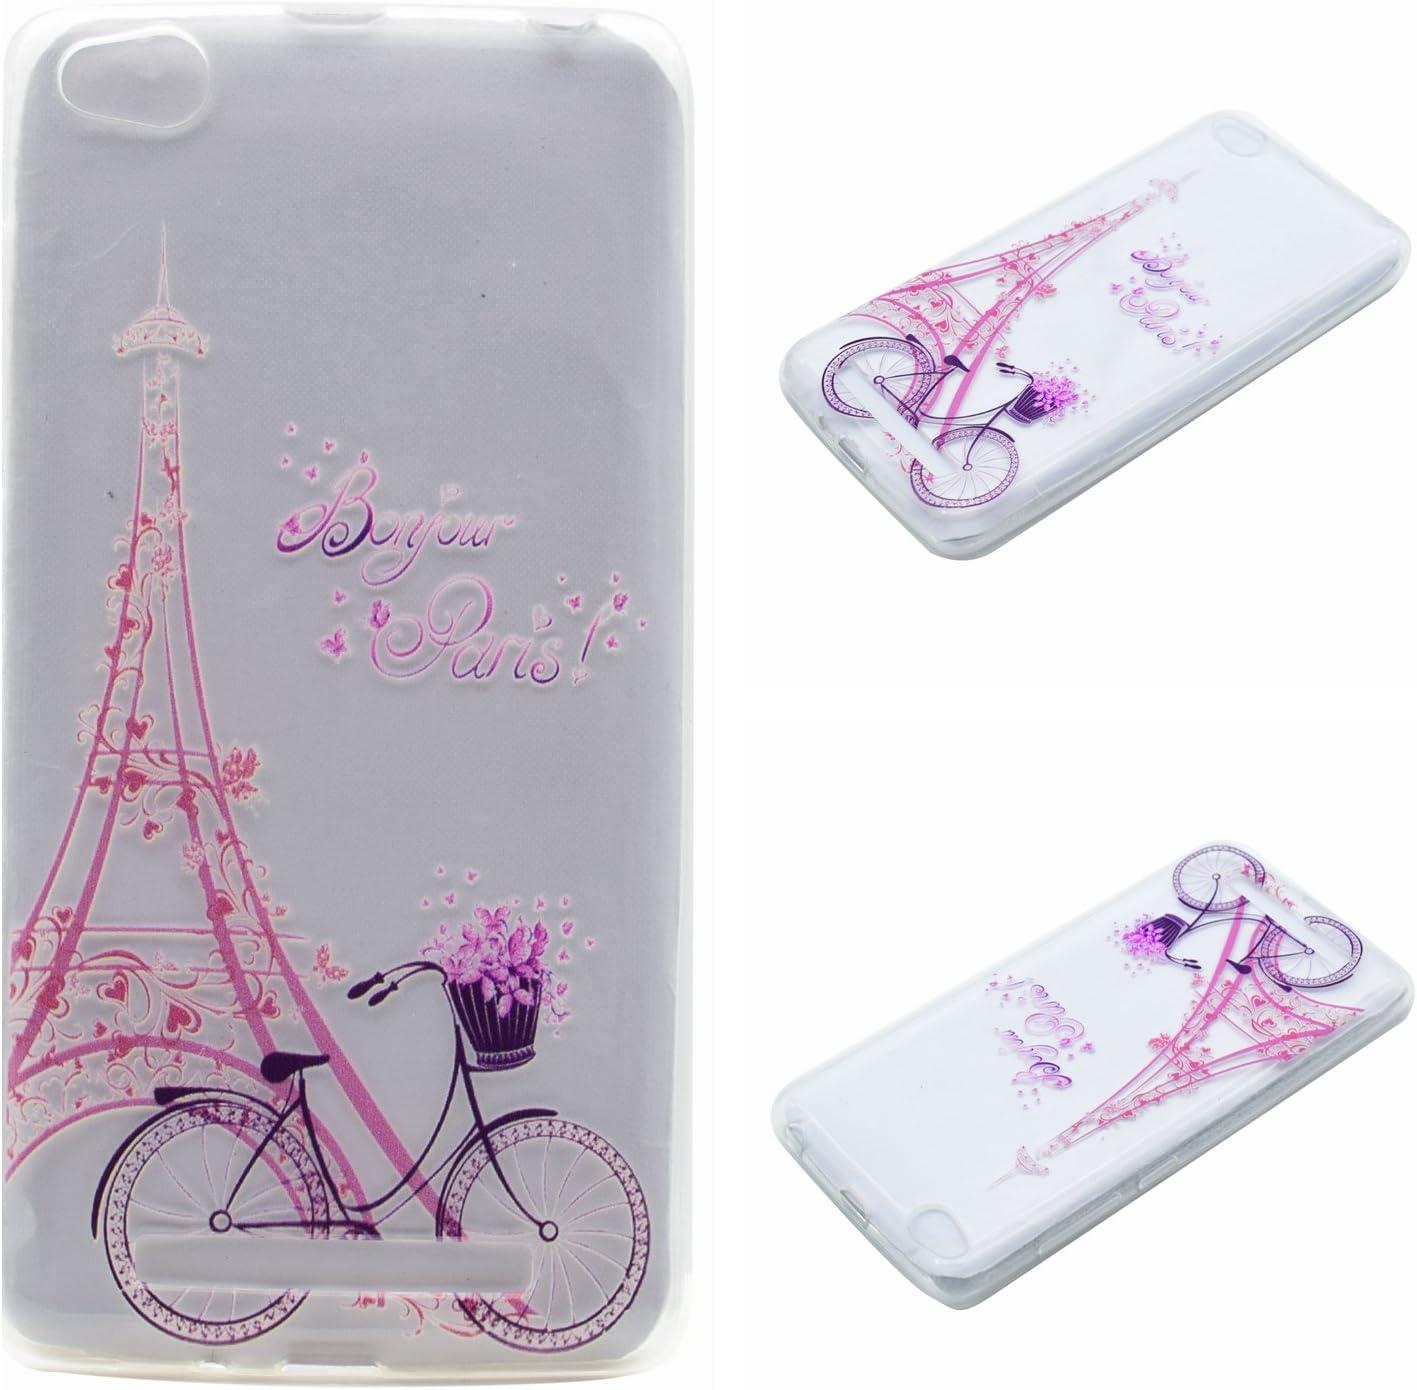 Qiaogle Teléfono Caso - Funda de TPU Silicona Carcasa Case Cover para Xiaomi HongMi 3 / Redmi3 Red Rice 3 (5.0 Pulgadas) - MM07 / Bonjour Paris